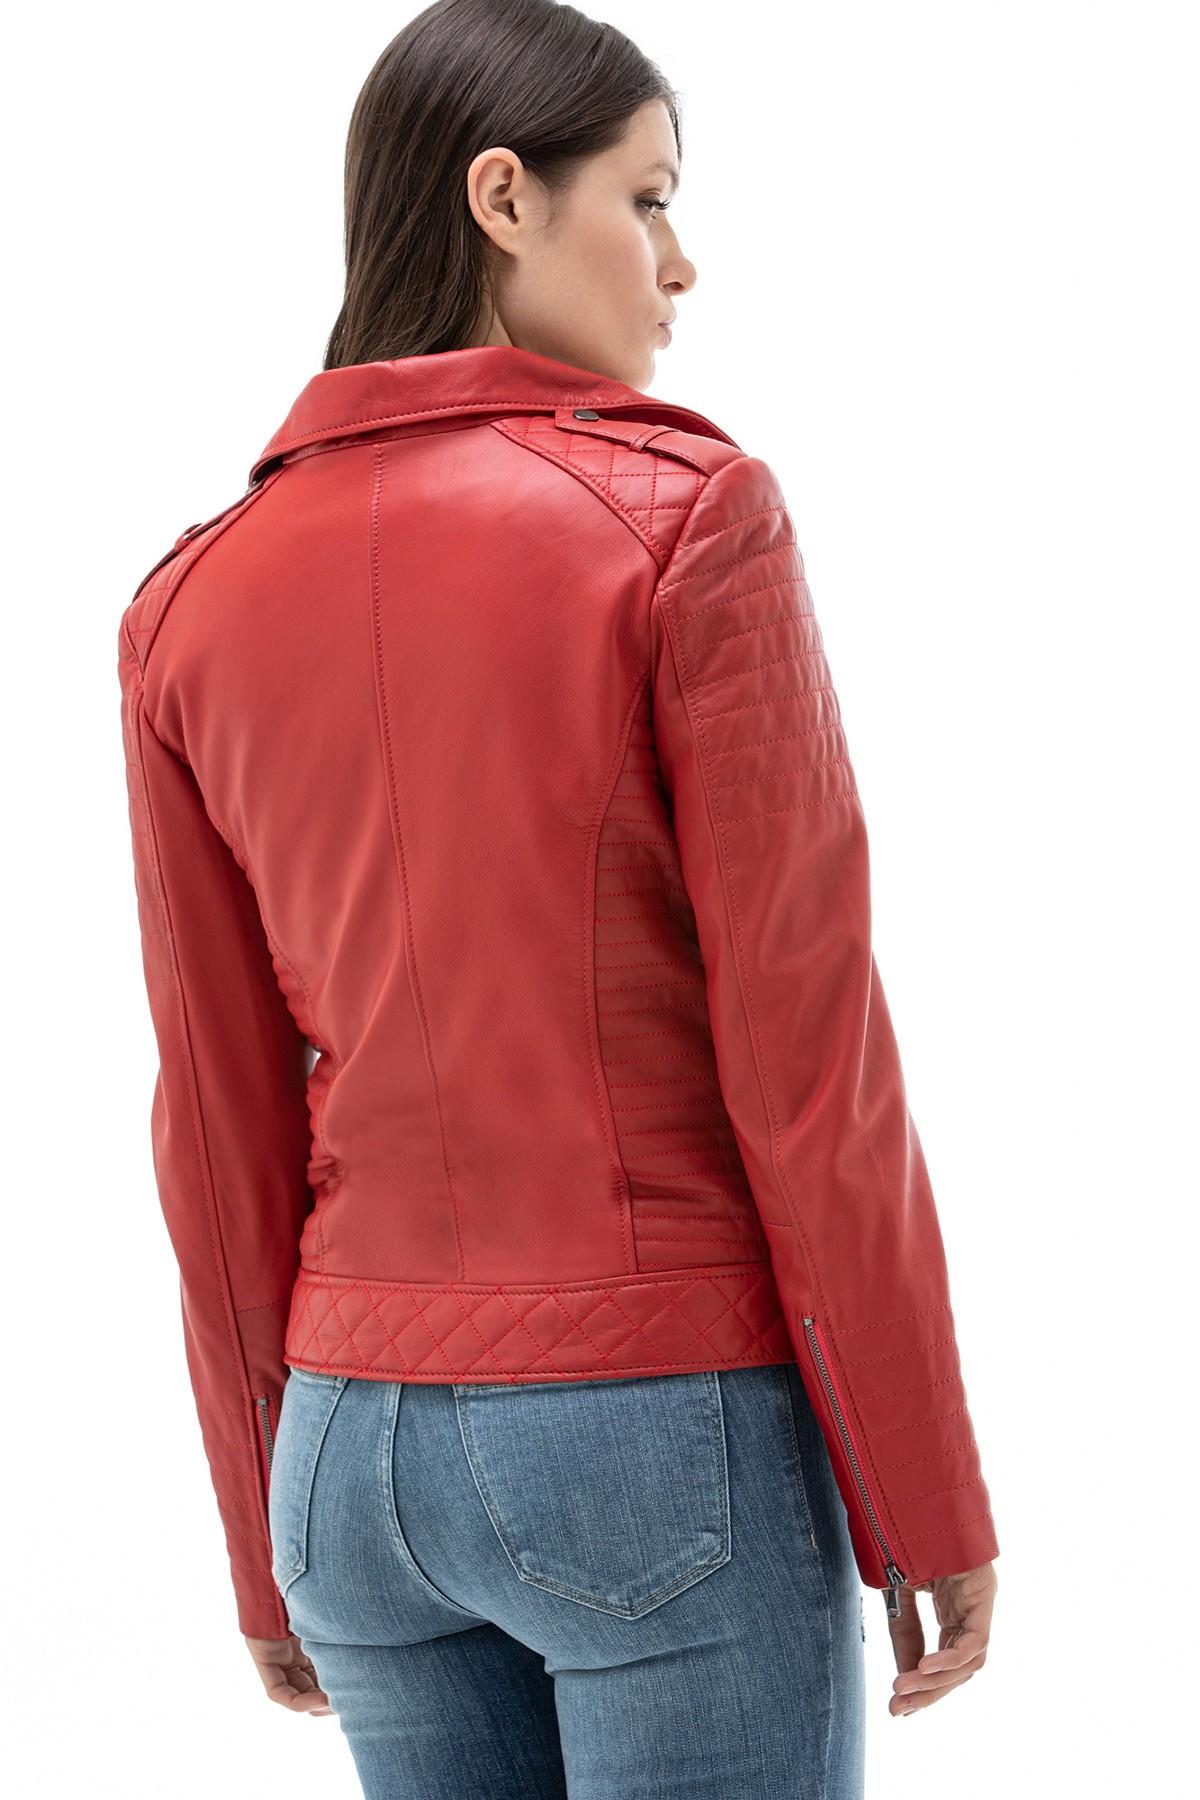 Dark Red Leather Jacket